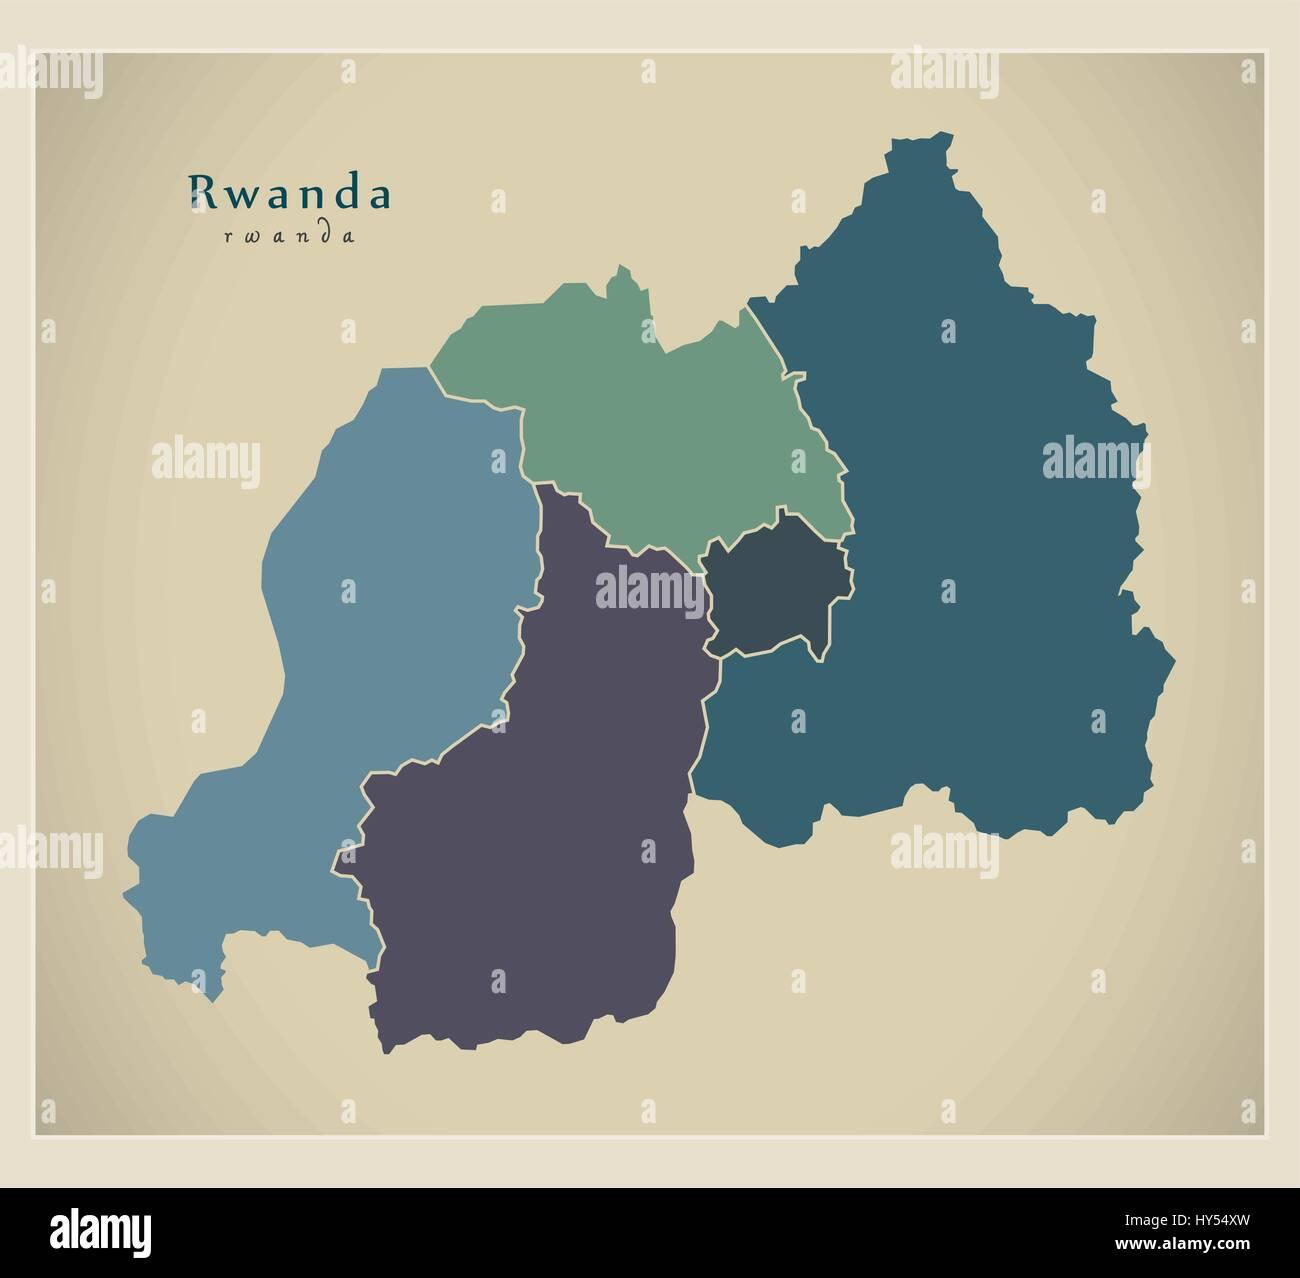 Modern Map - Rwanda with provinces colored RW - Stock Vector